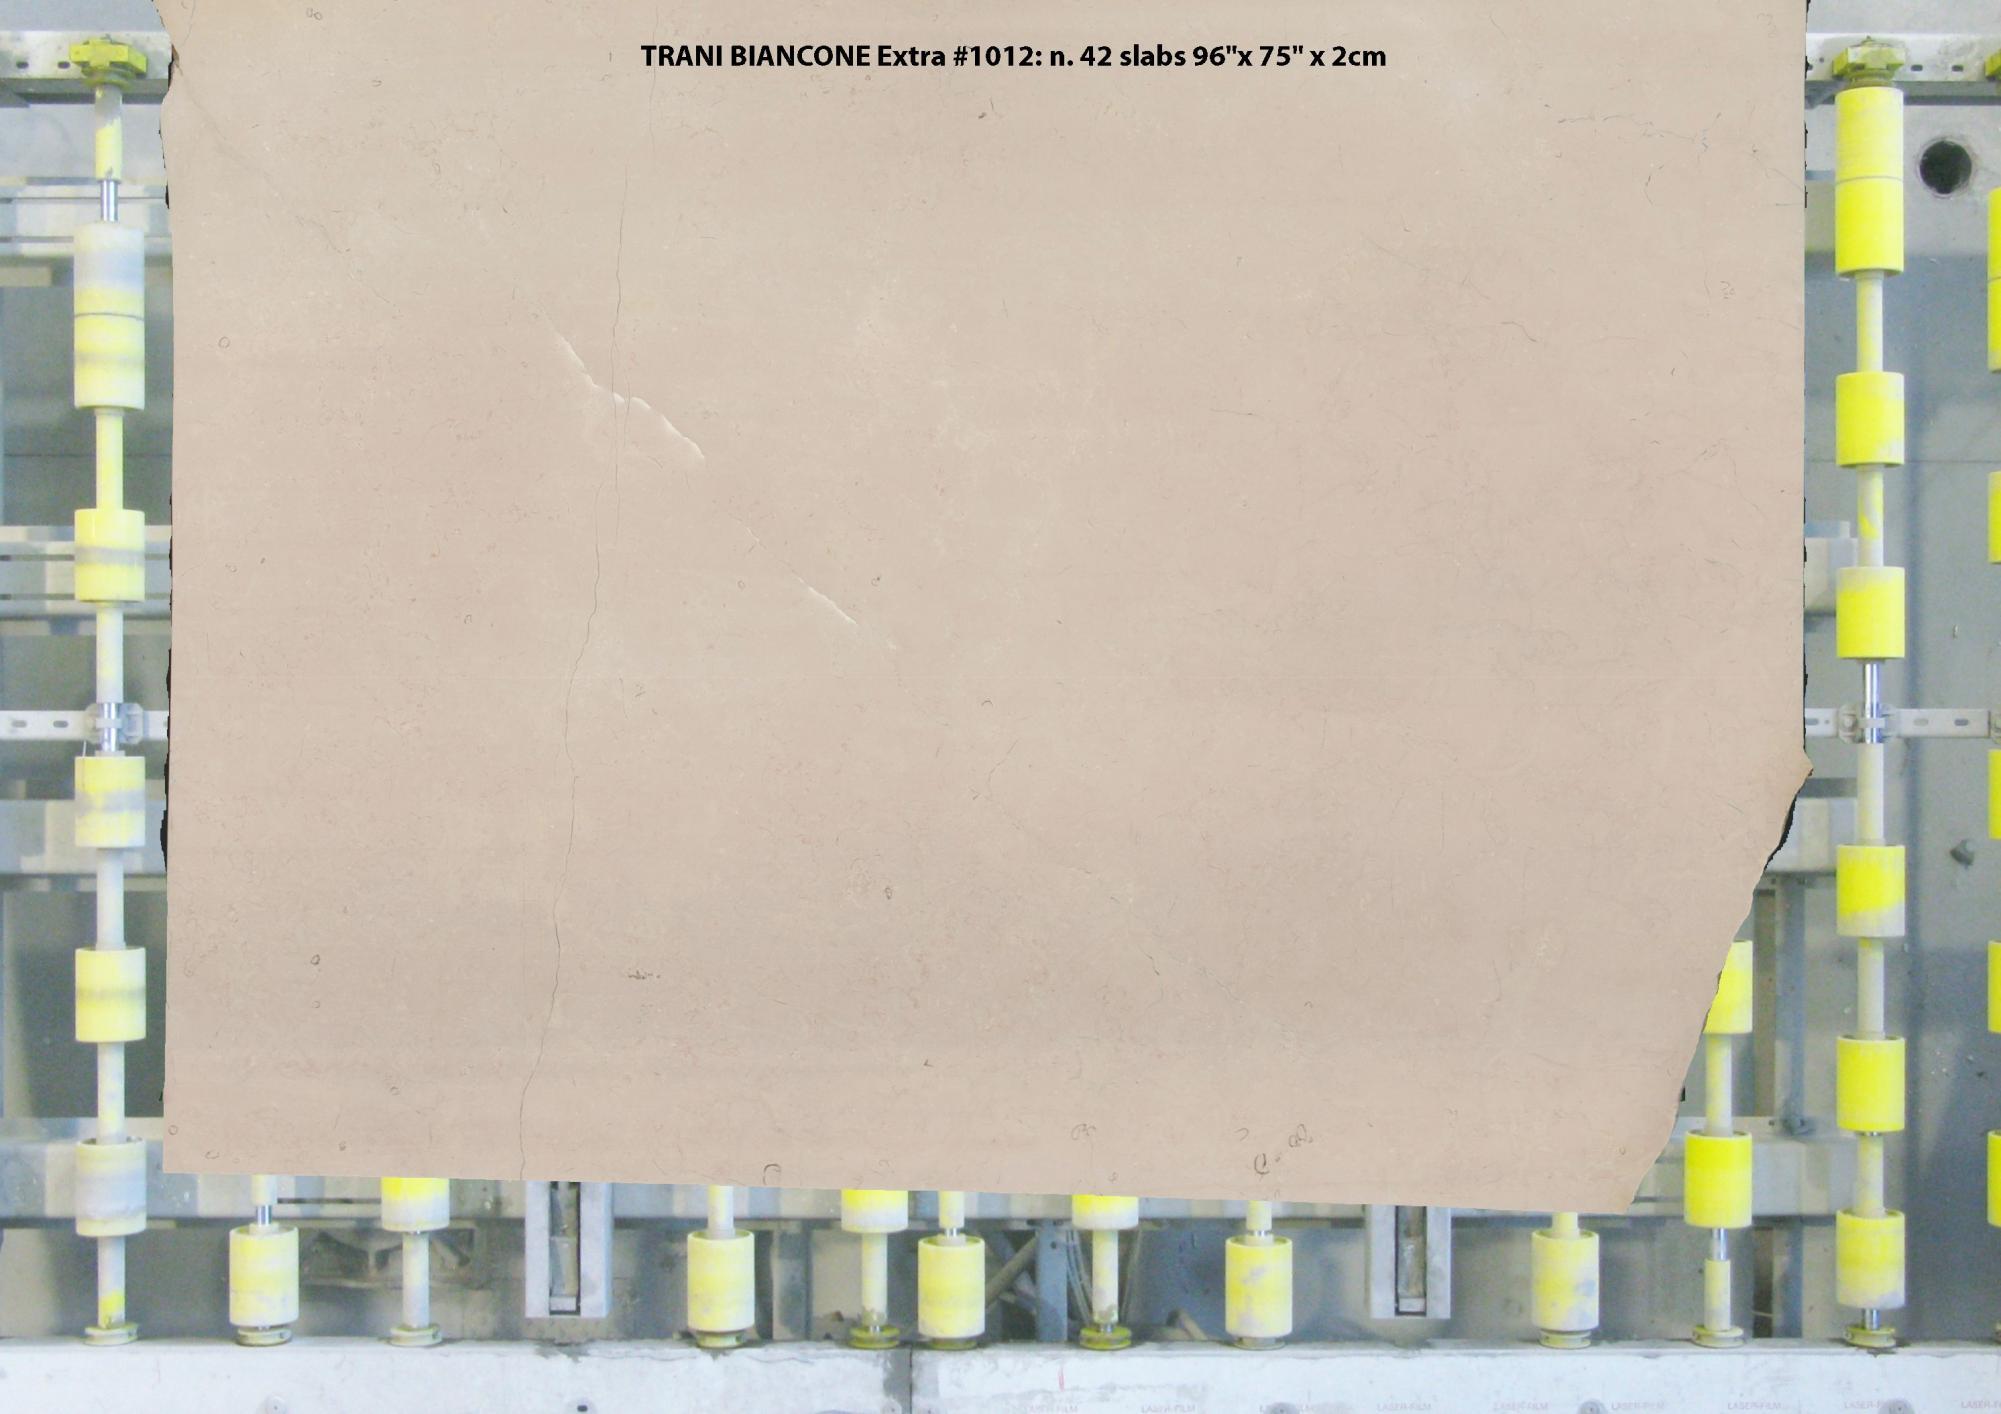 TRANI BIANCONE EXTRA Fourniture (Italie) d' dalles brillantes en marbre naturel 1012 , Slab #15